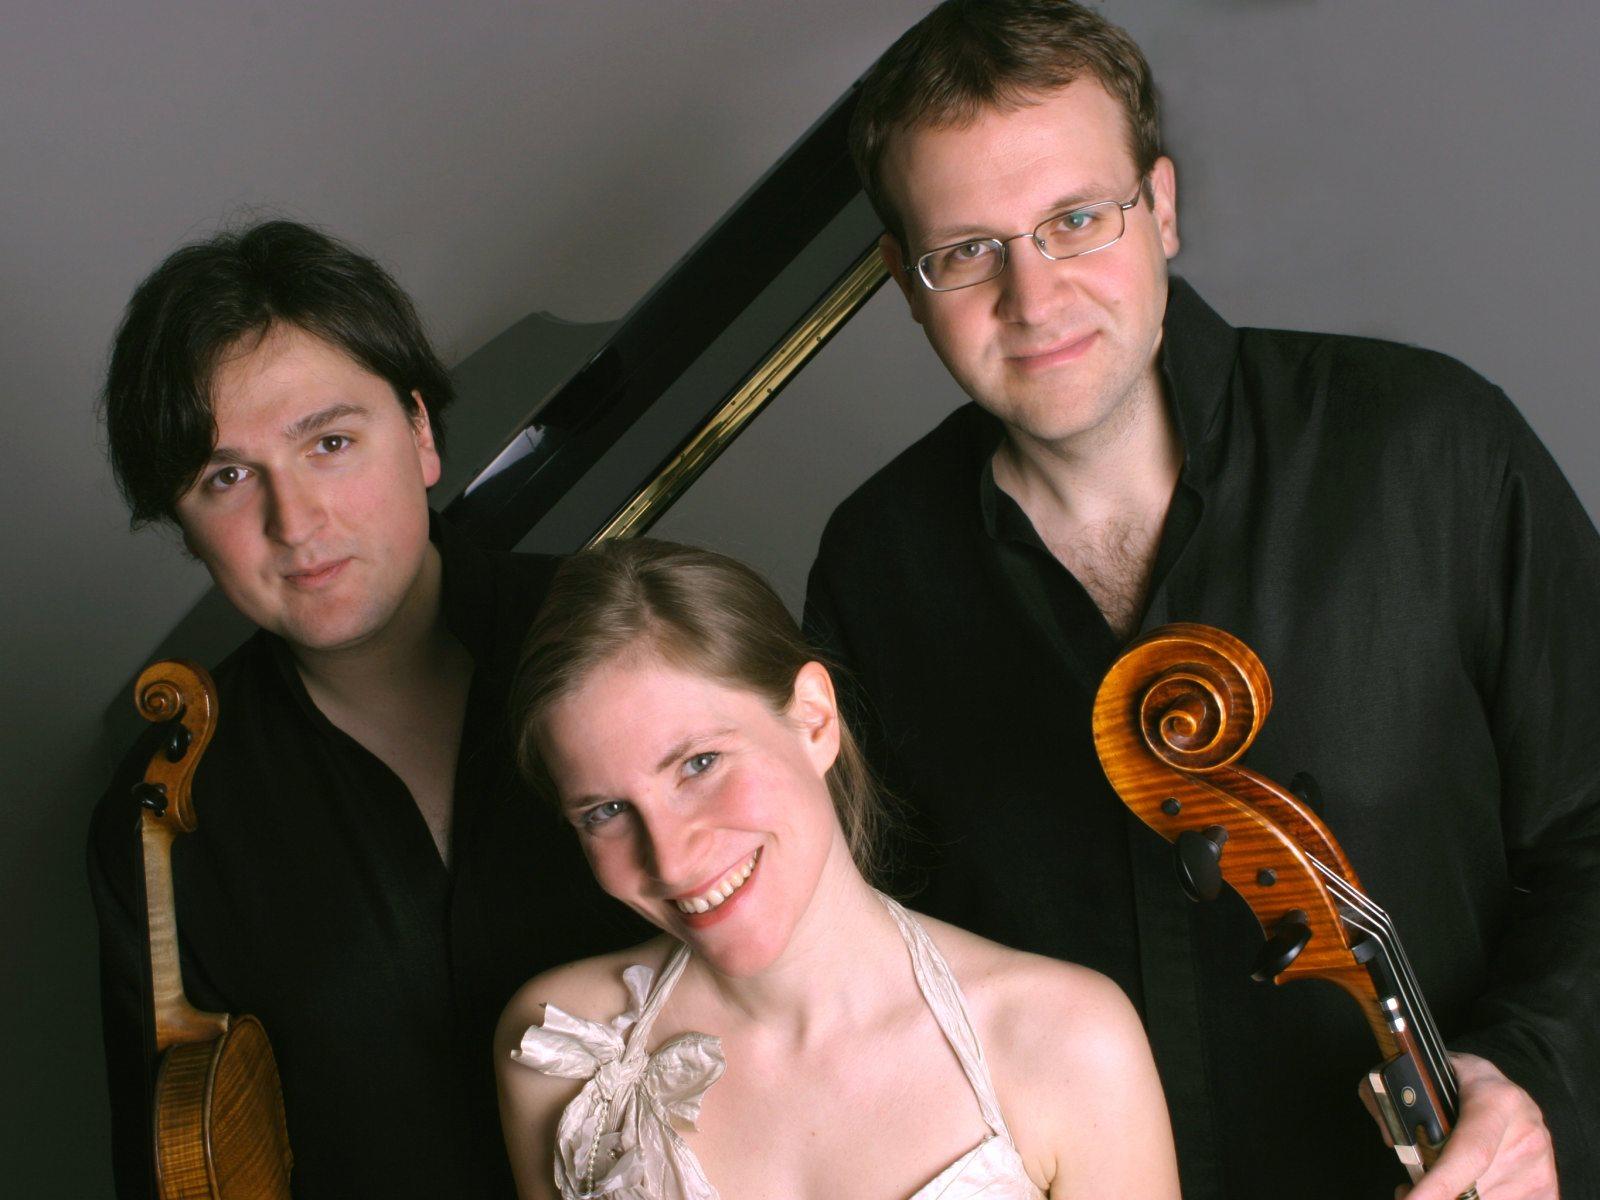 Review of the Morgenstern Trio (Stefan Hempel, violin